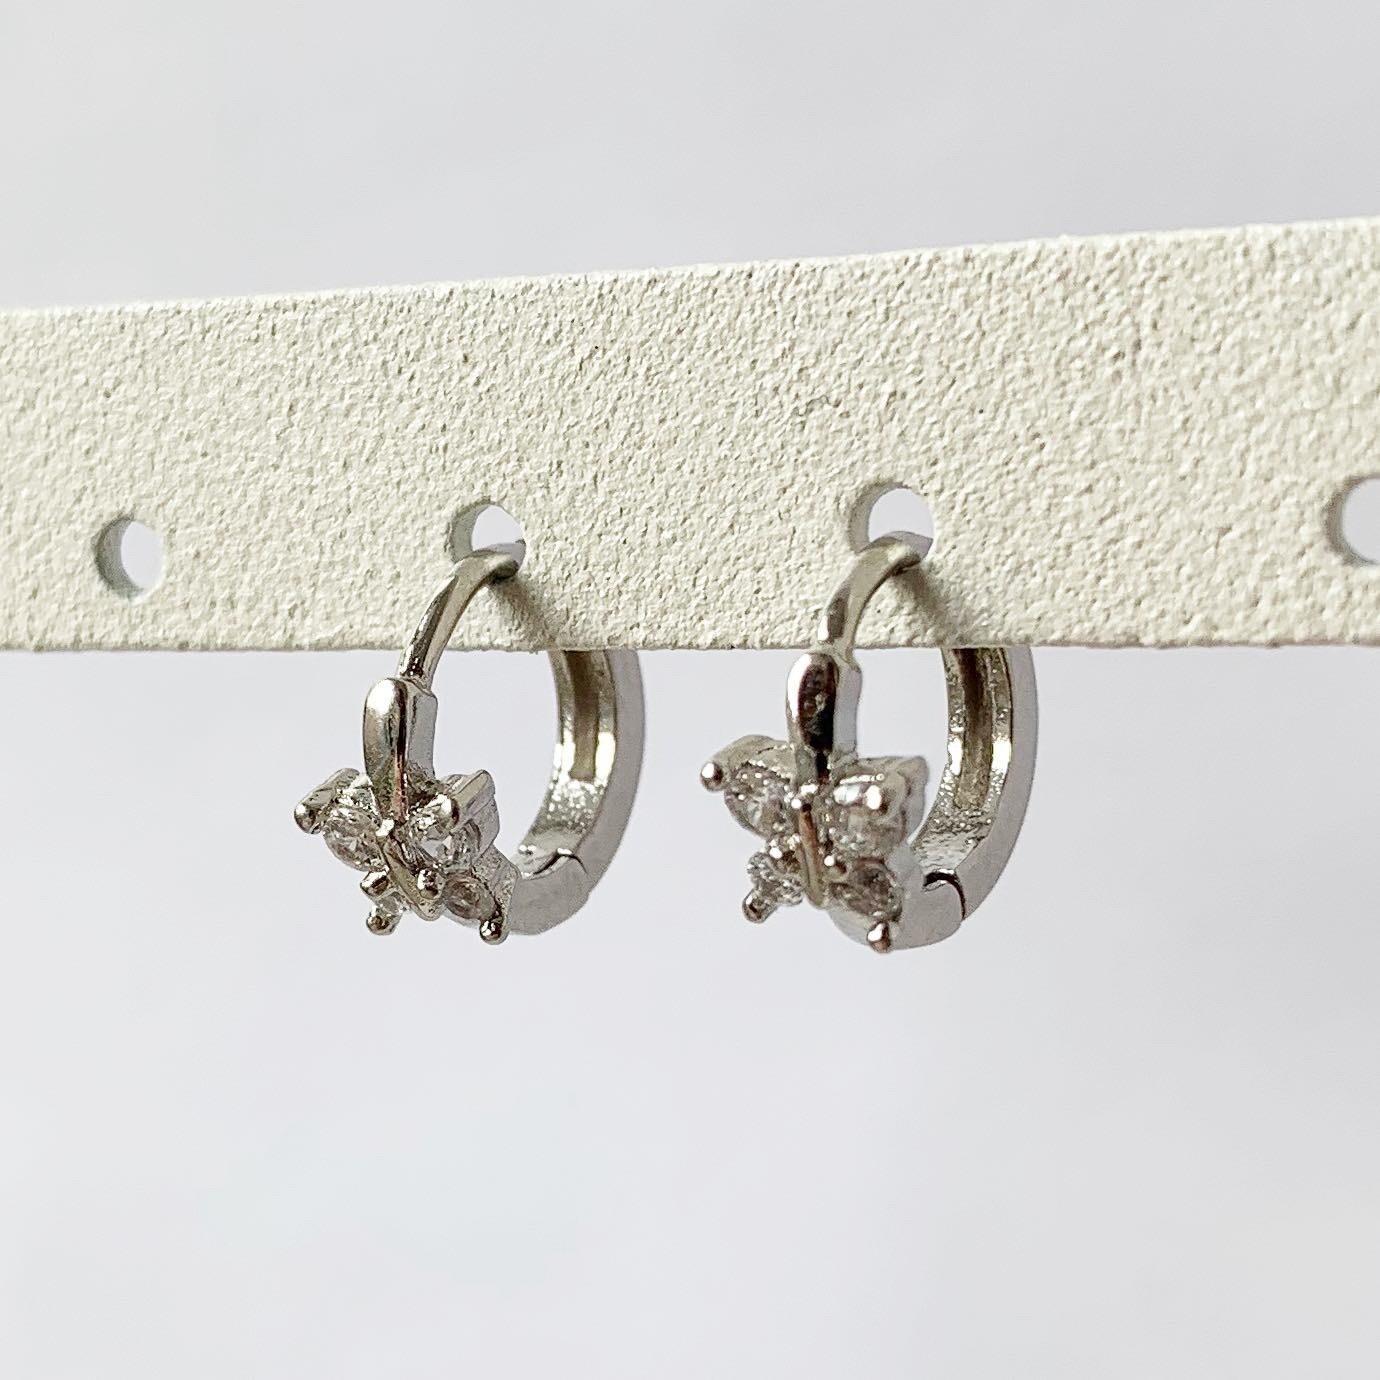 Vlinder oorringetjes 925 sterling zilver met zirkonia steentjes 8 mm